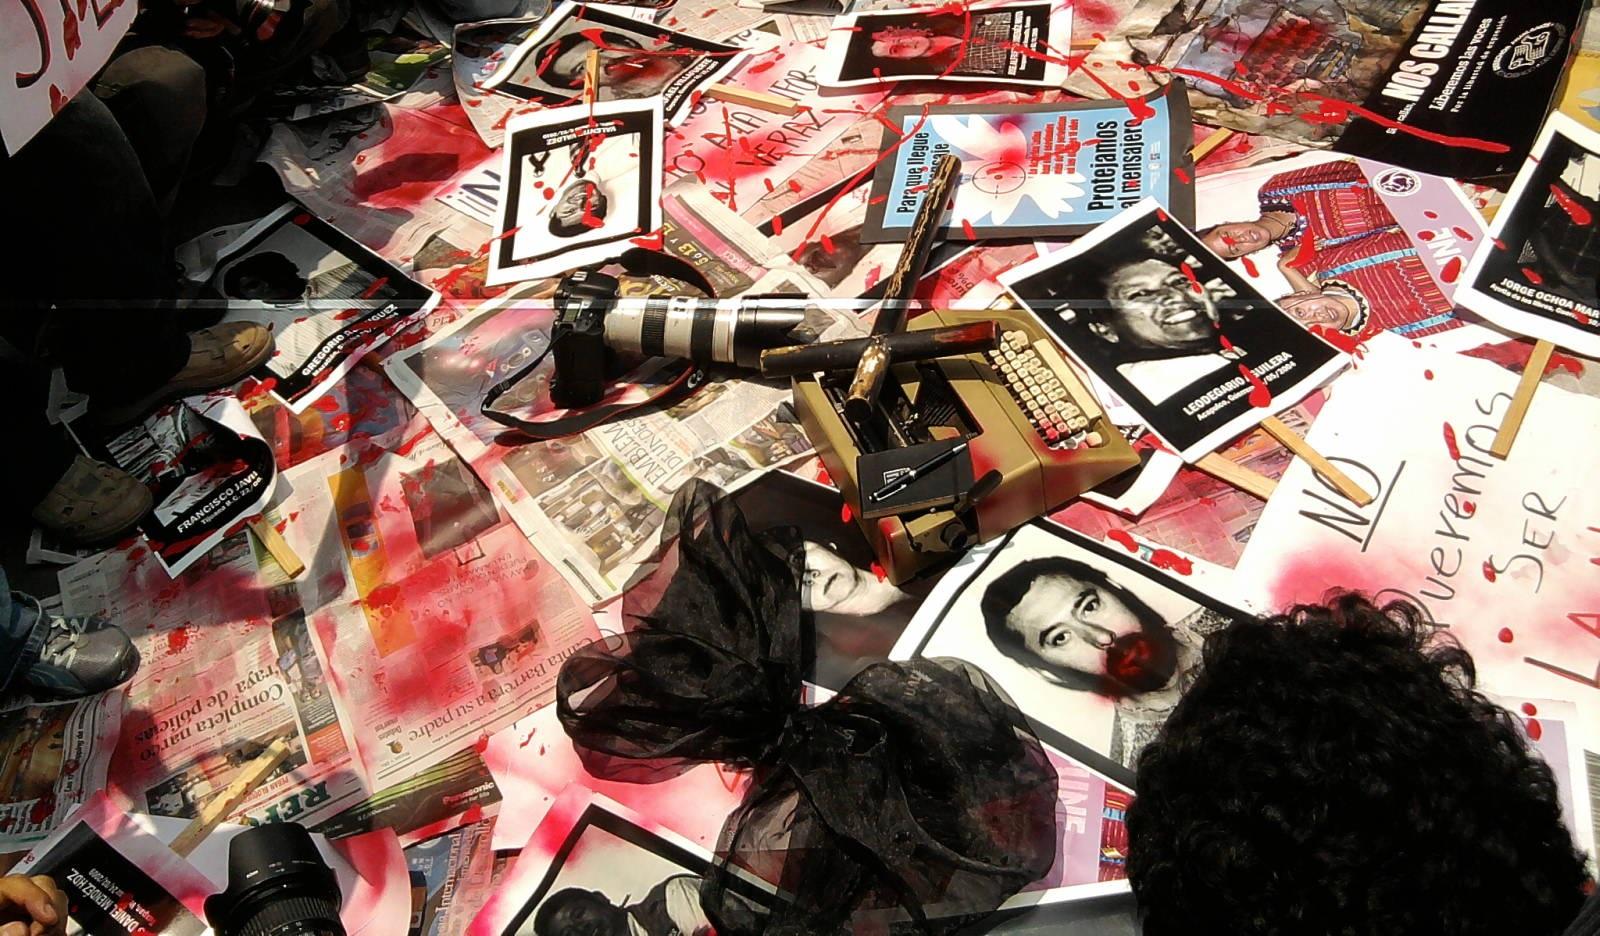 Un periodista es asesinado cada dos semanas en América